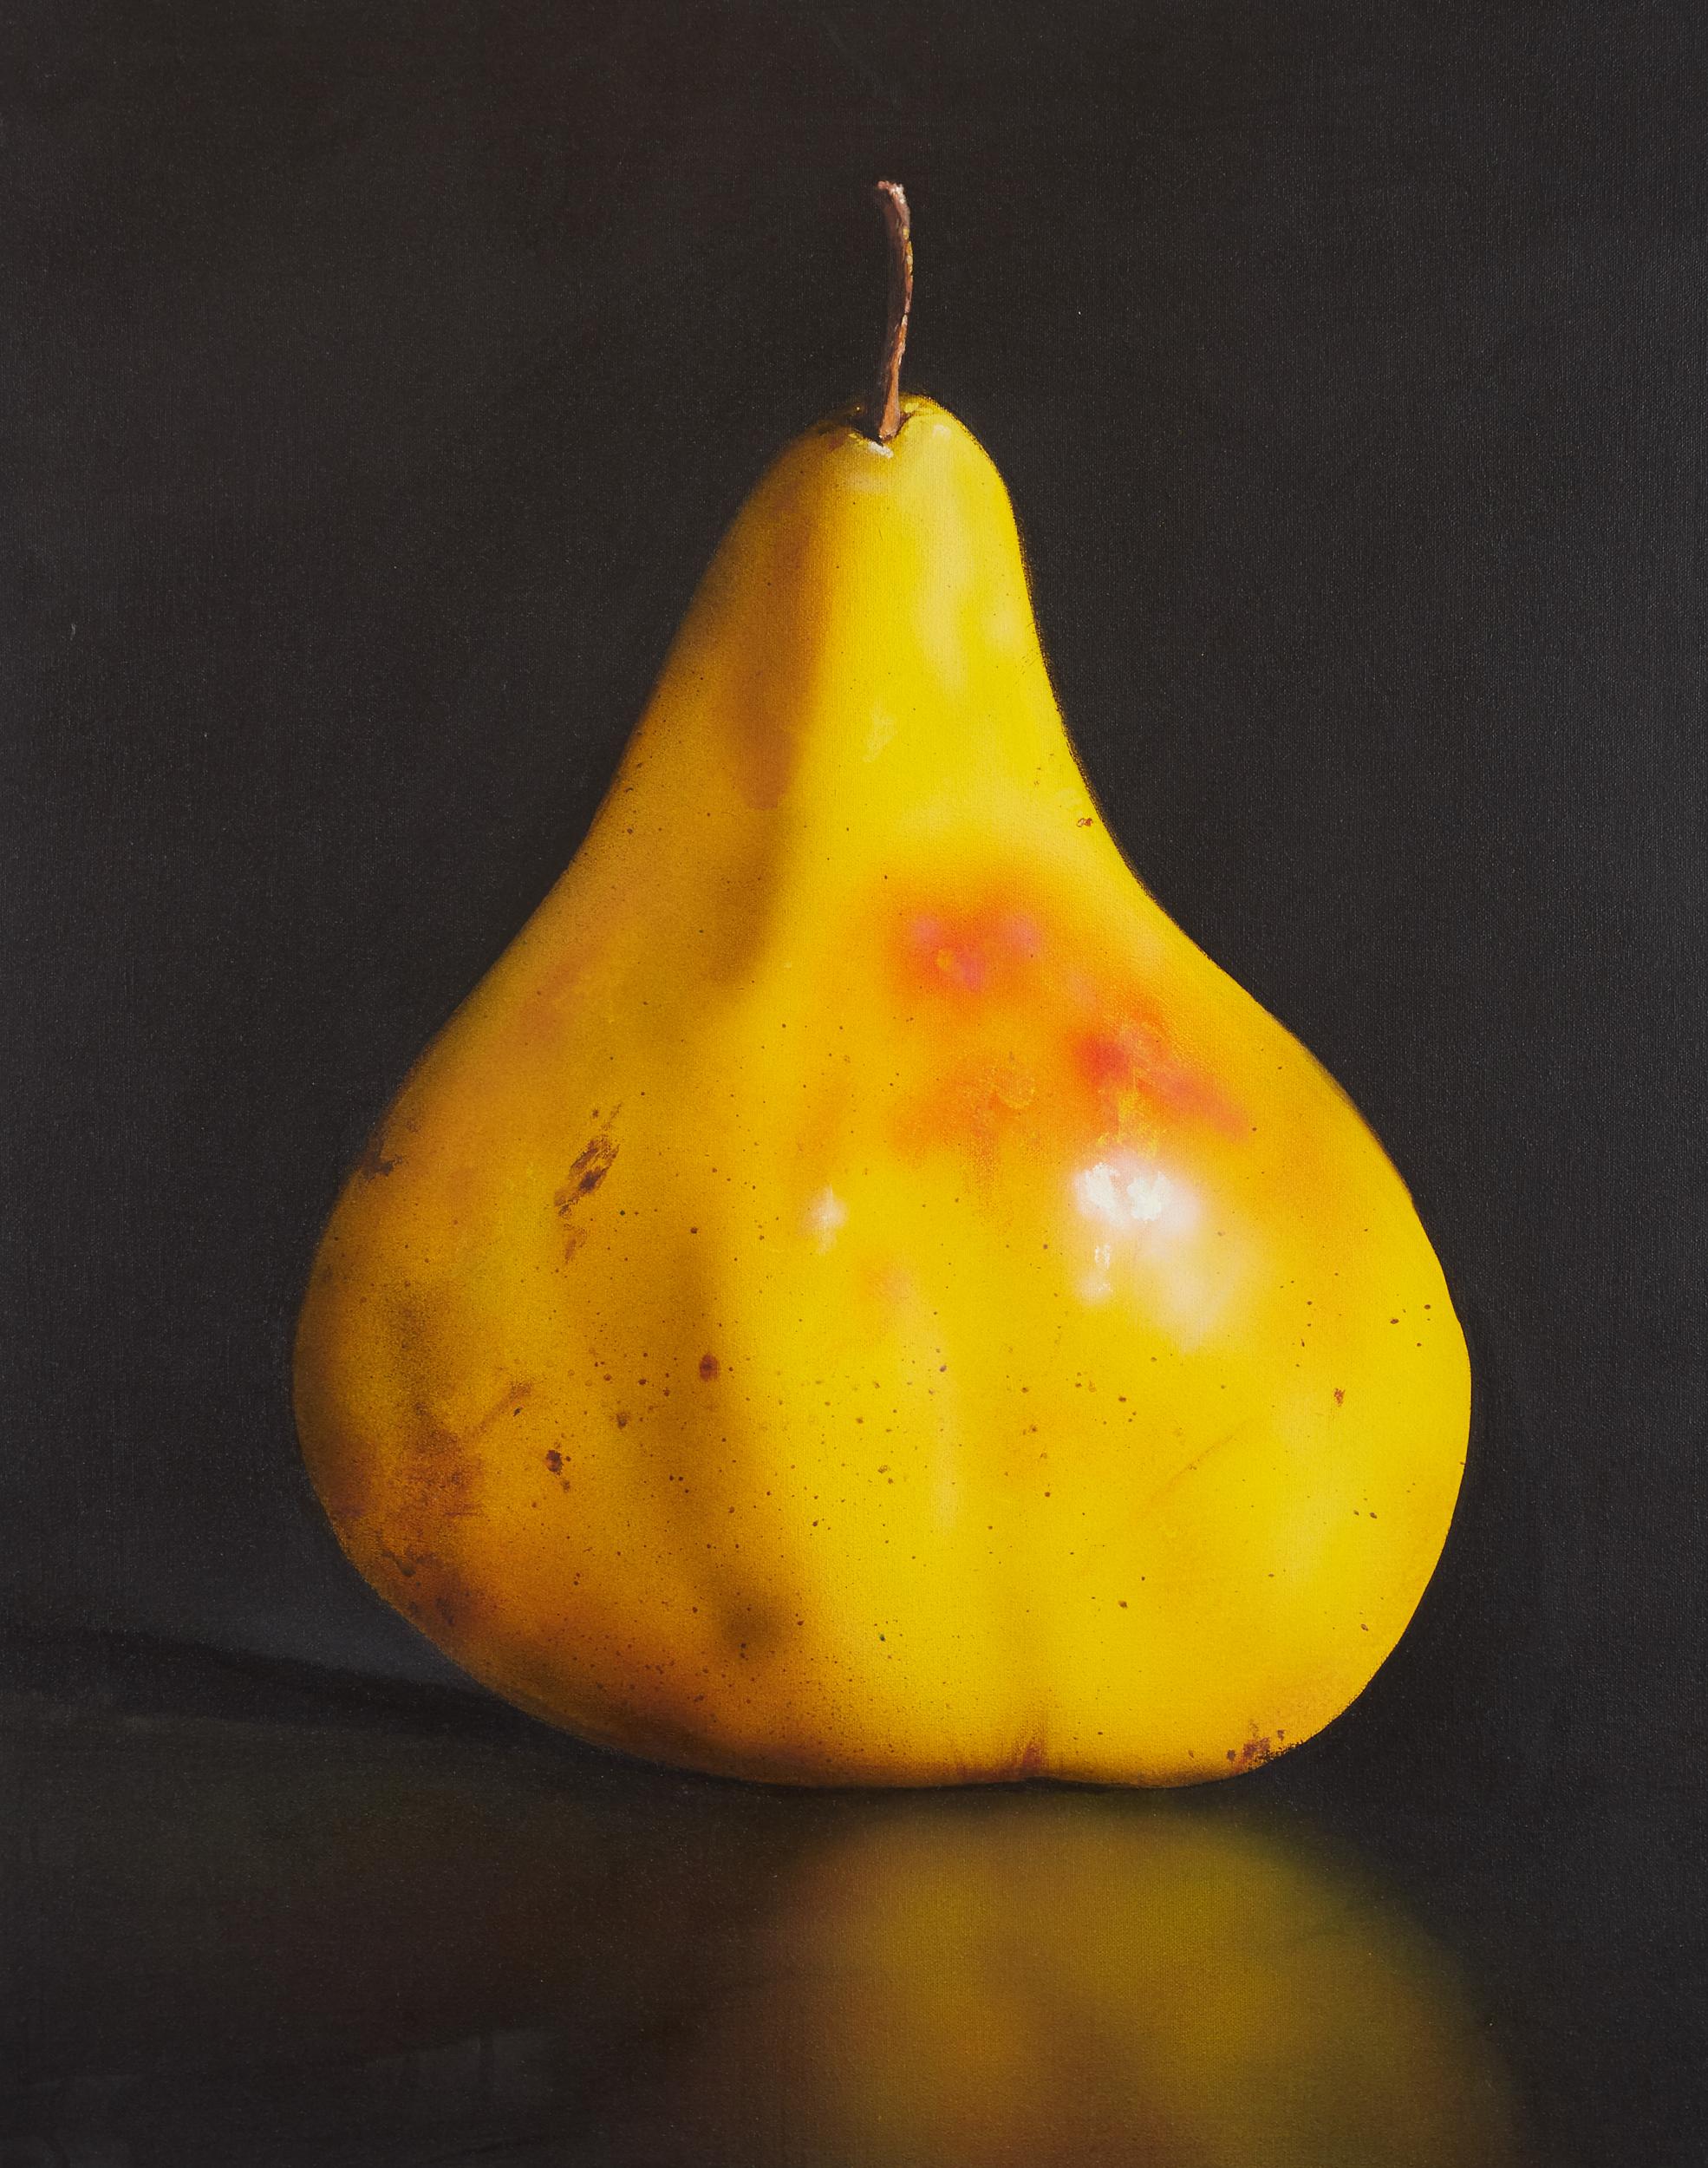 Lot 30 - Tom Seghi Yellow Pear Painting